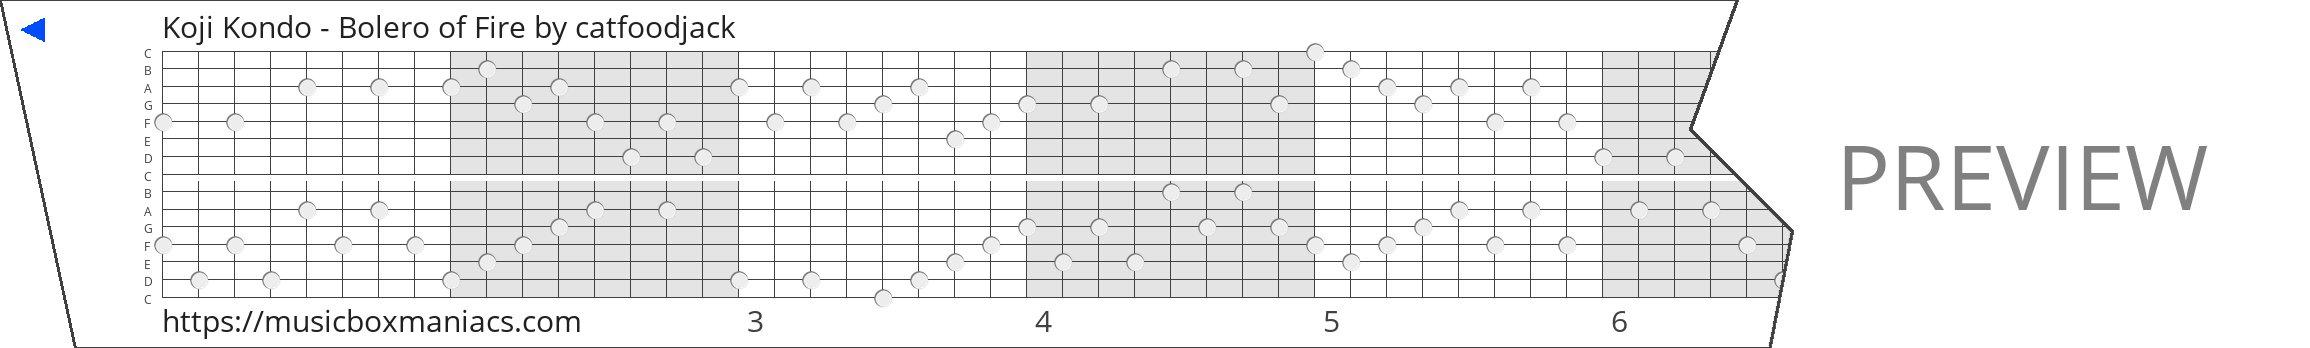 Koji Kondo - Bolero of Fire 15 note music box paper strip